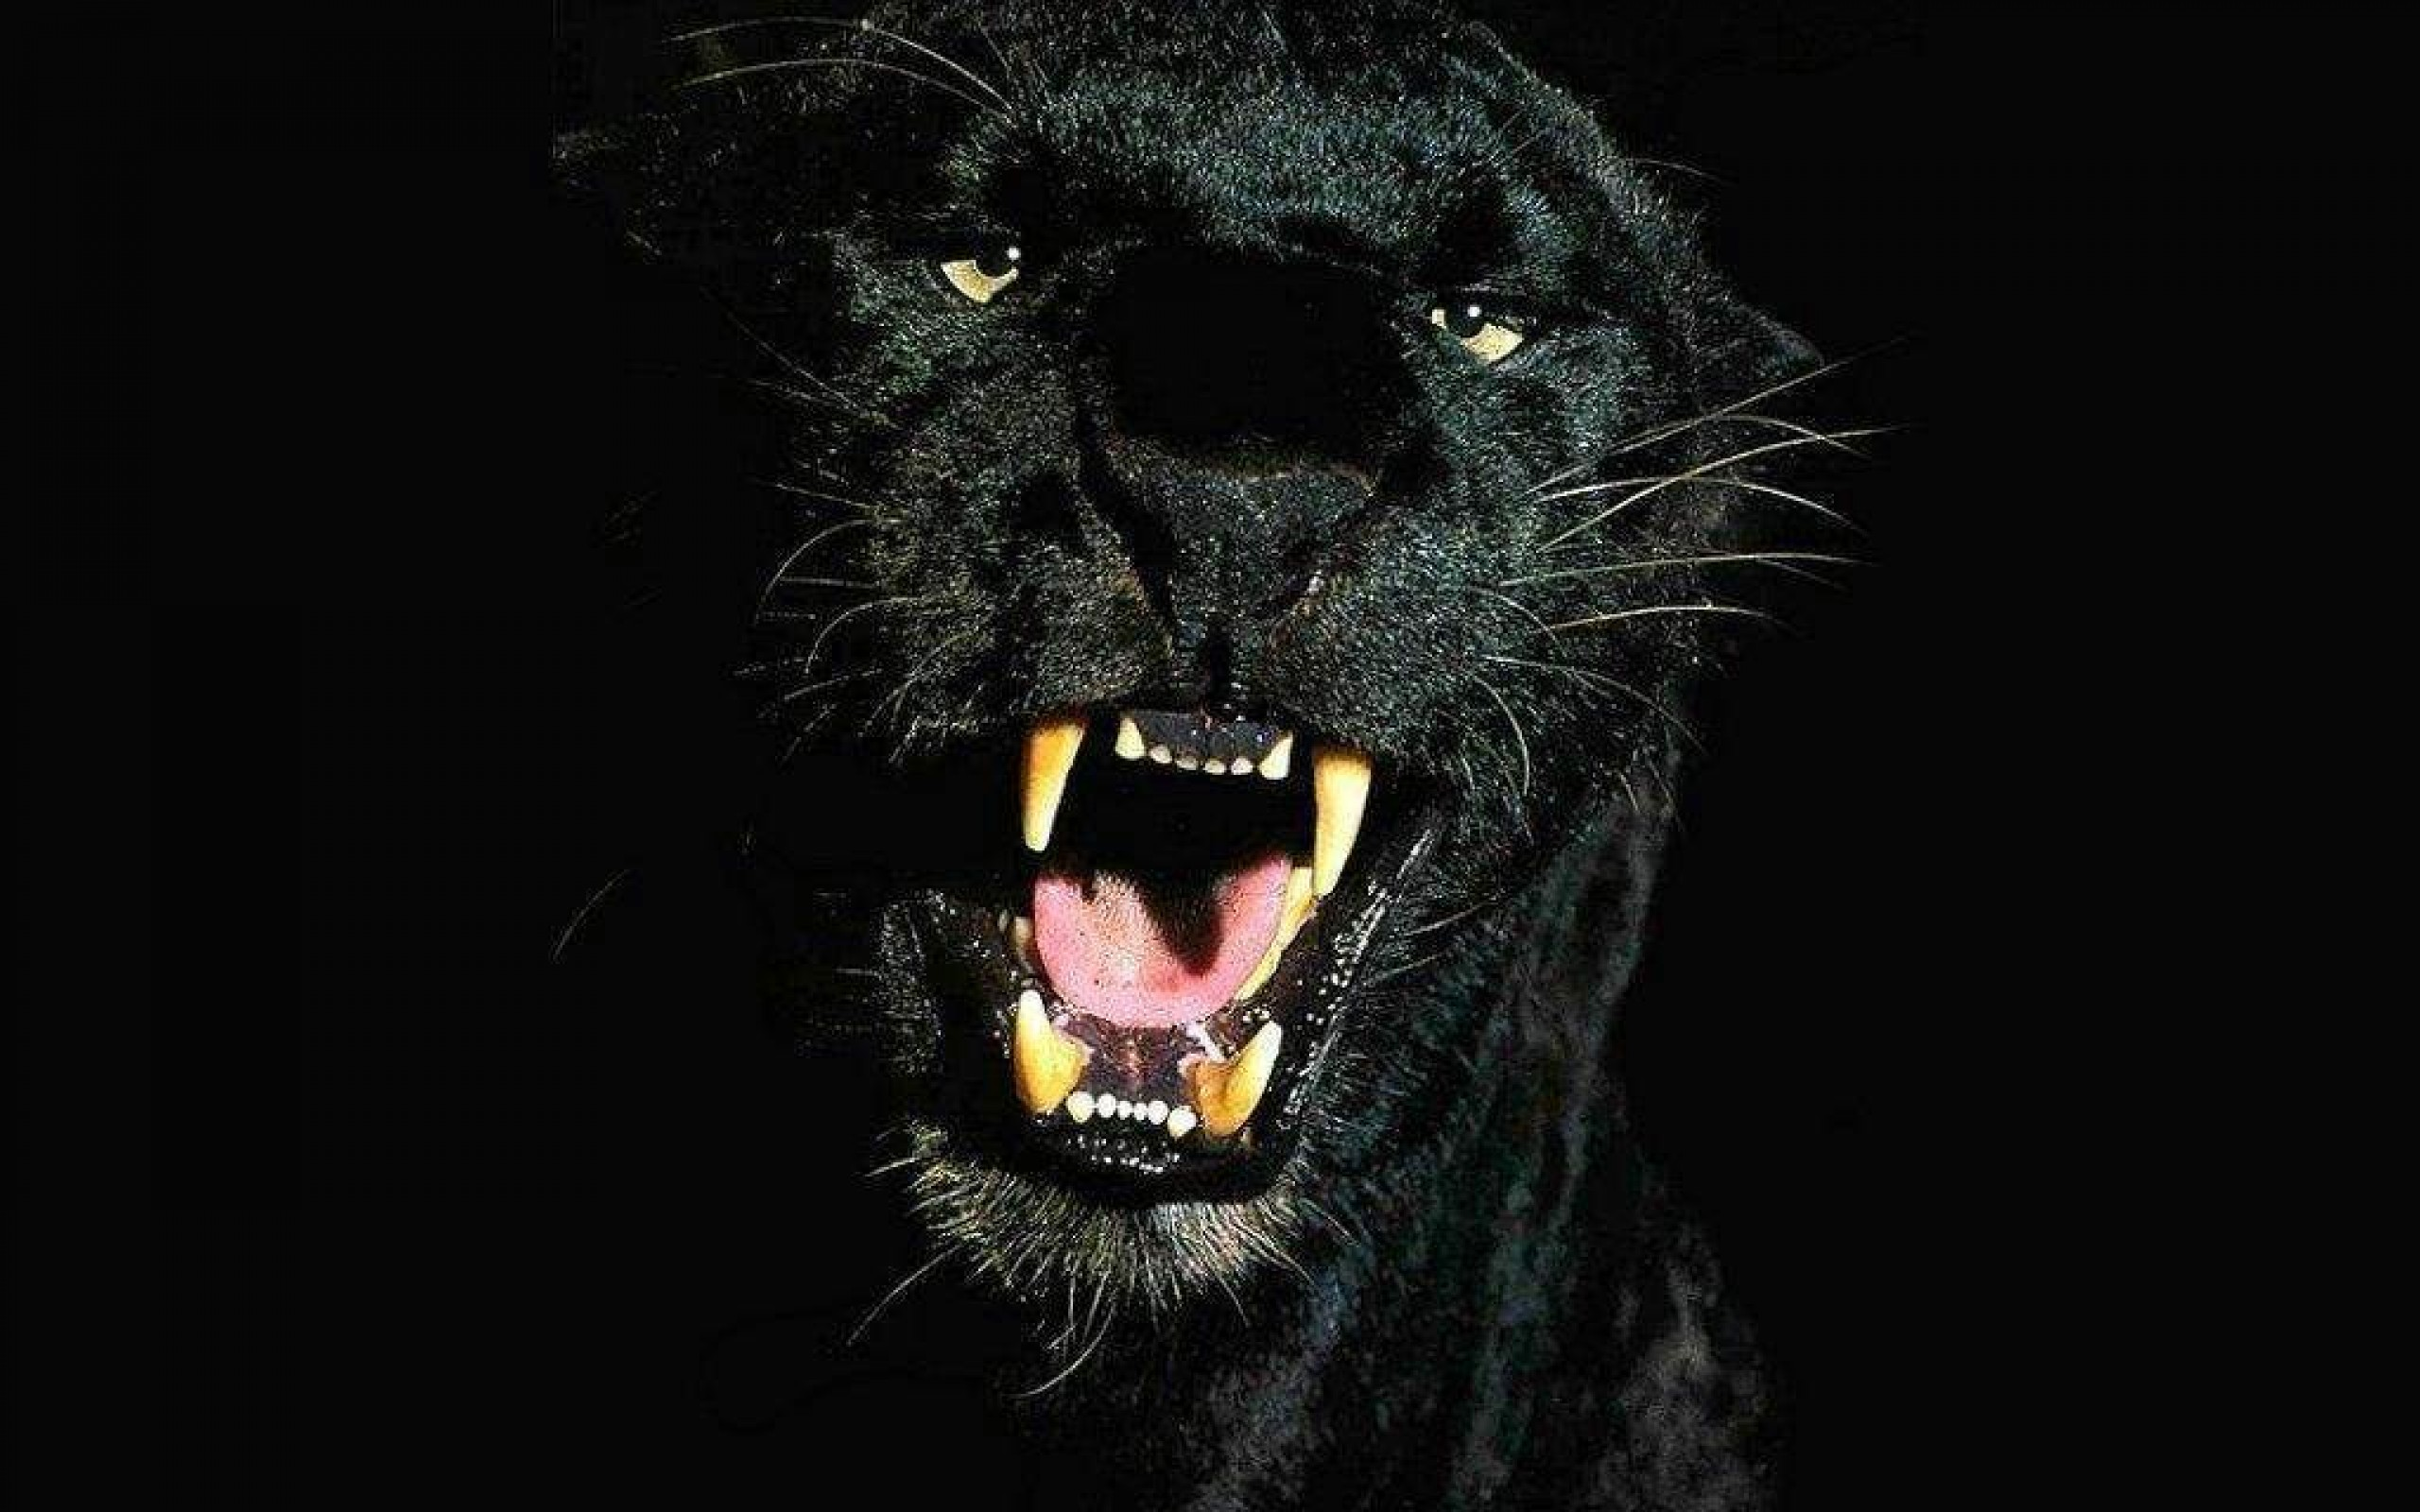 40 Black Leopard HD Wallpapers 1808 Black Leopard Hd 2560x1600